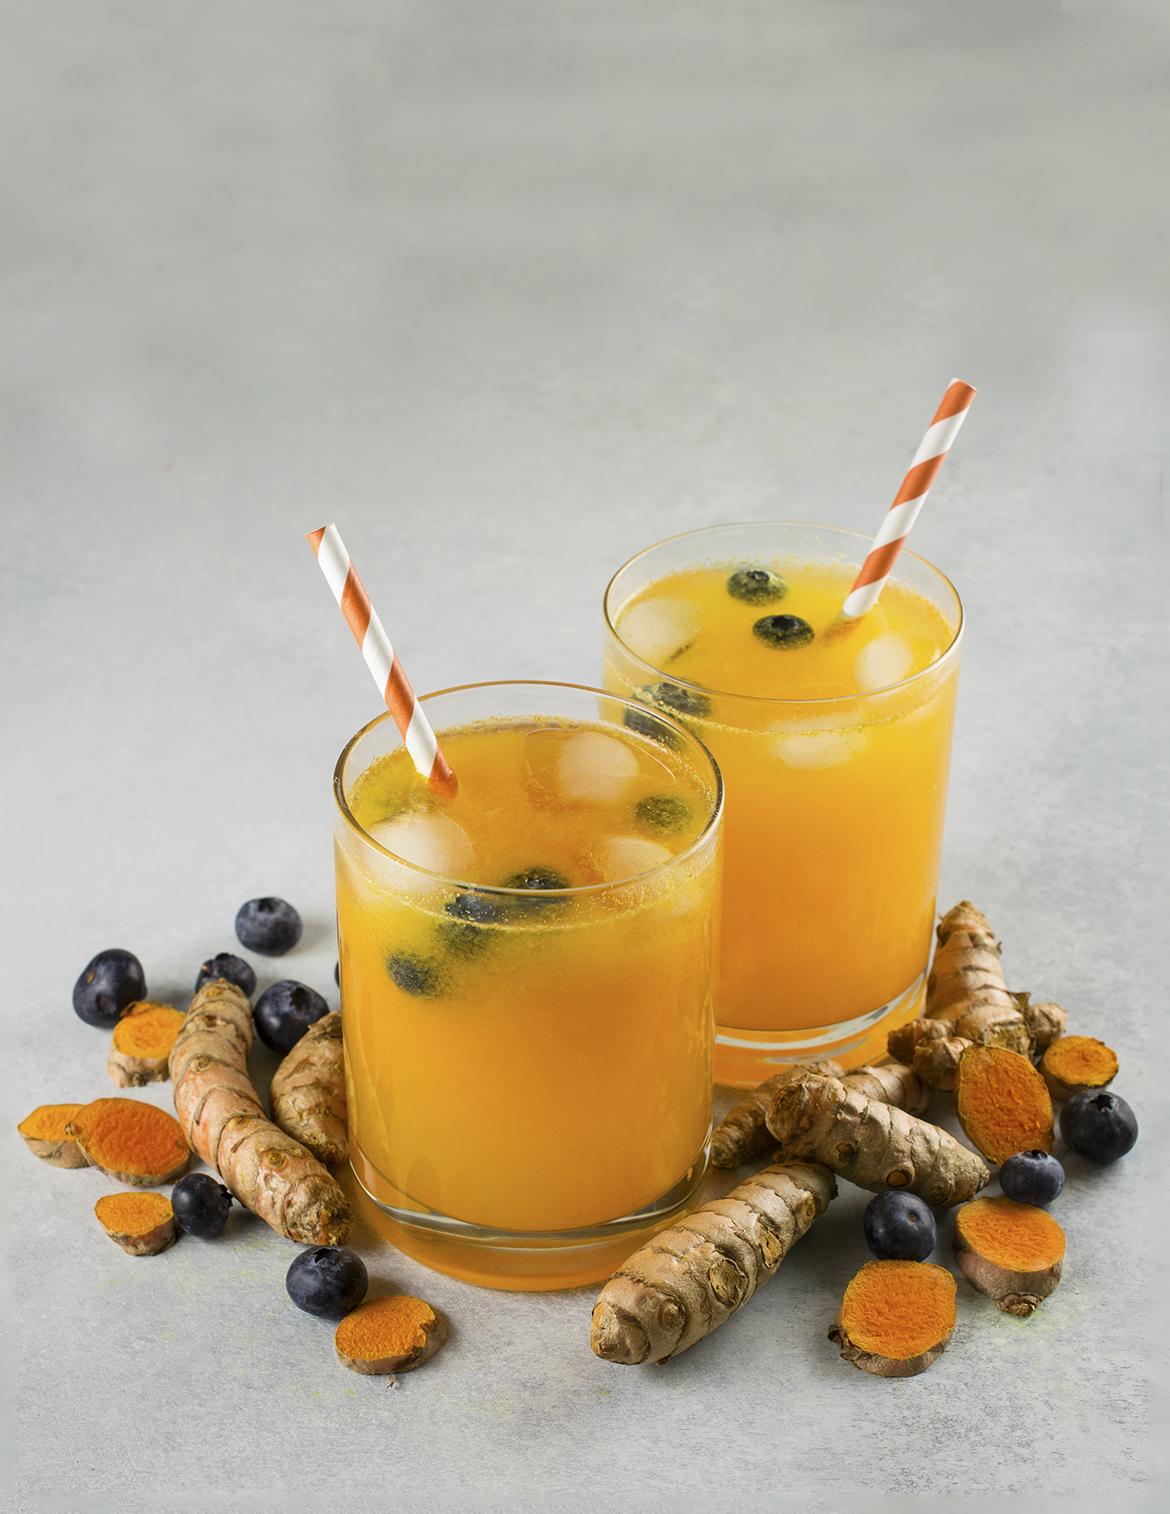 Turmeric Lemonade with Blueberry recipe